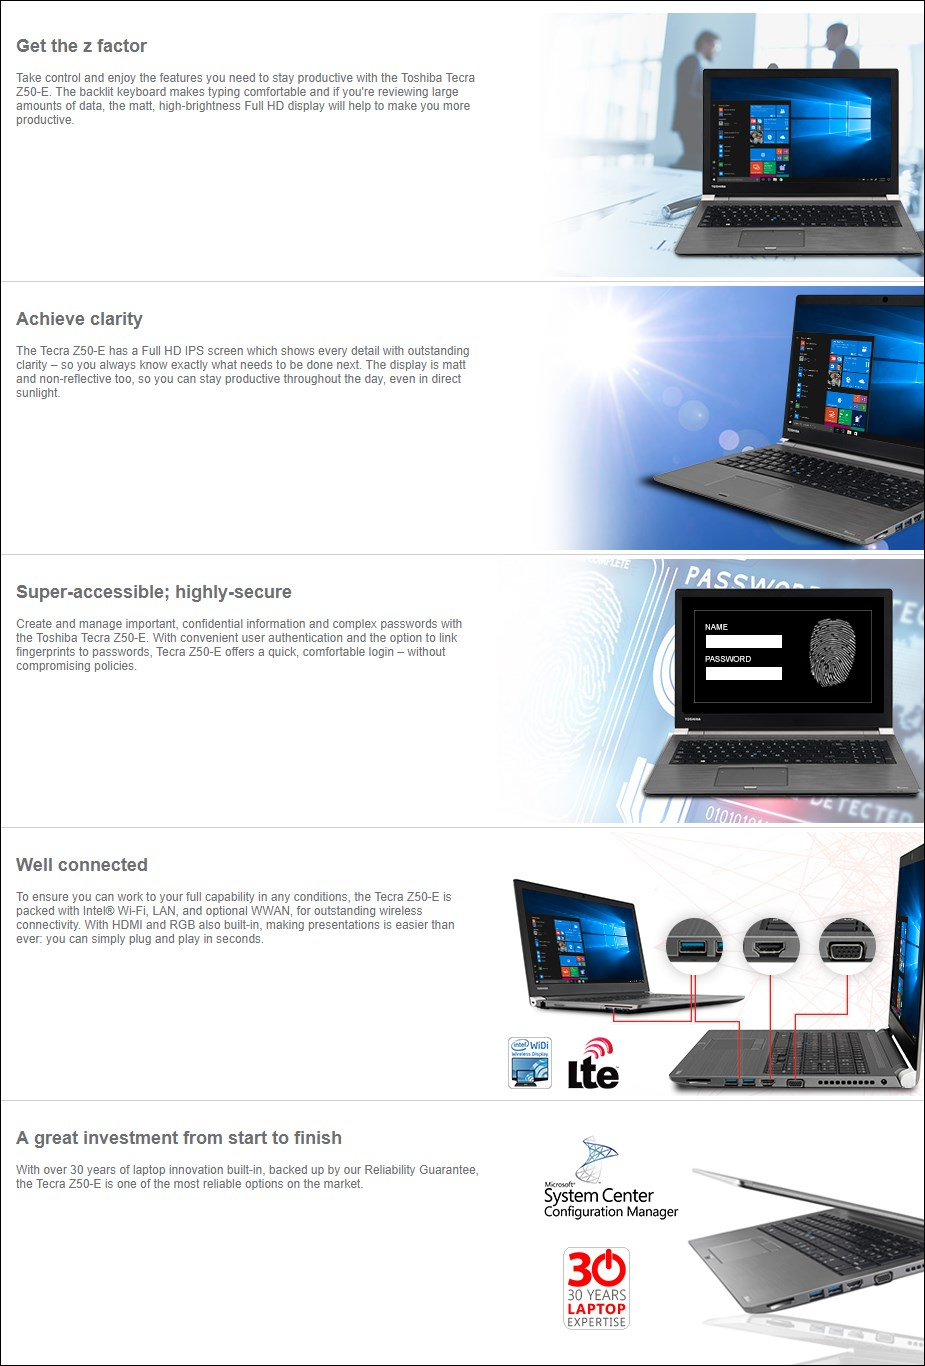 toshiba-tecra-z50e-156a-laptop-i58250u-8gb-256gb-w10p-ac27018-2-1-.jpg